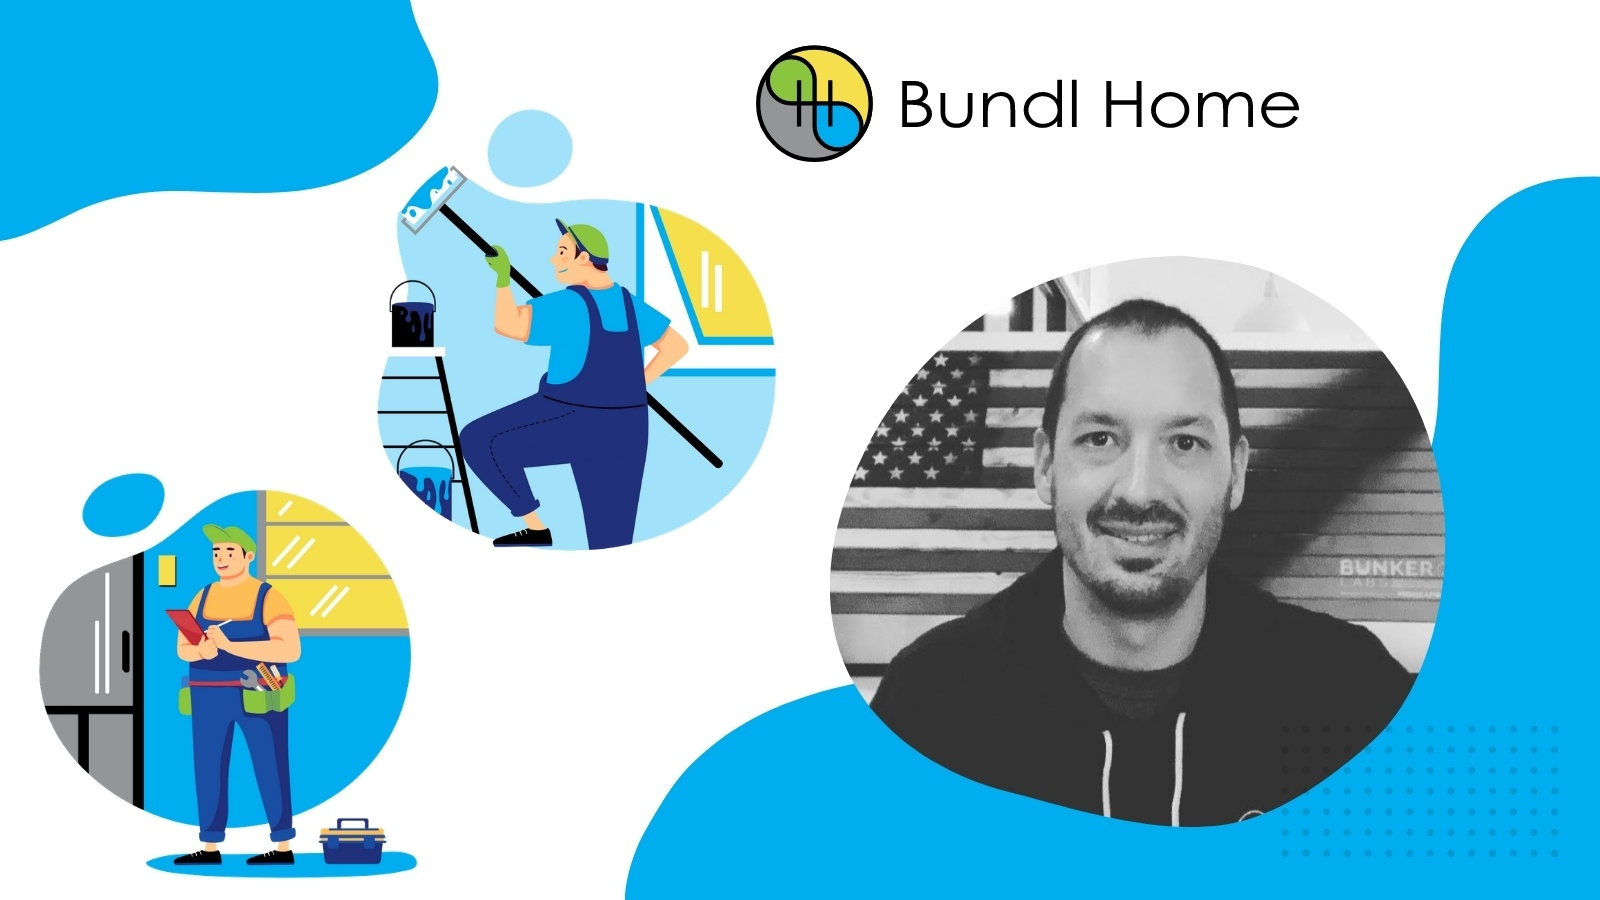 Bundl Home - Founder Story